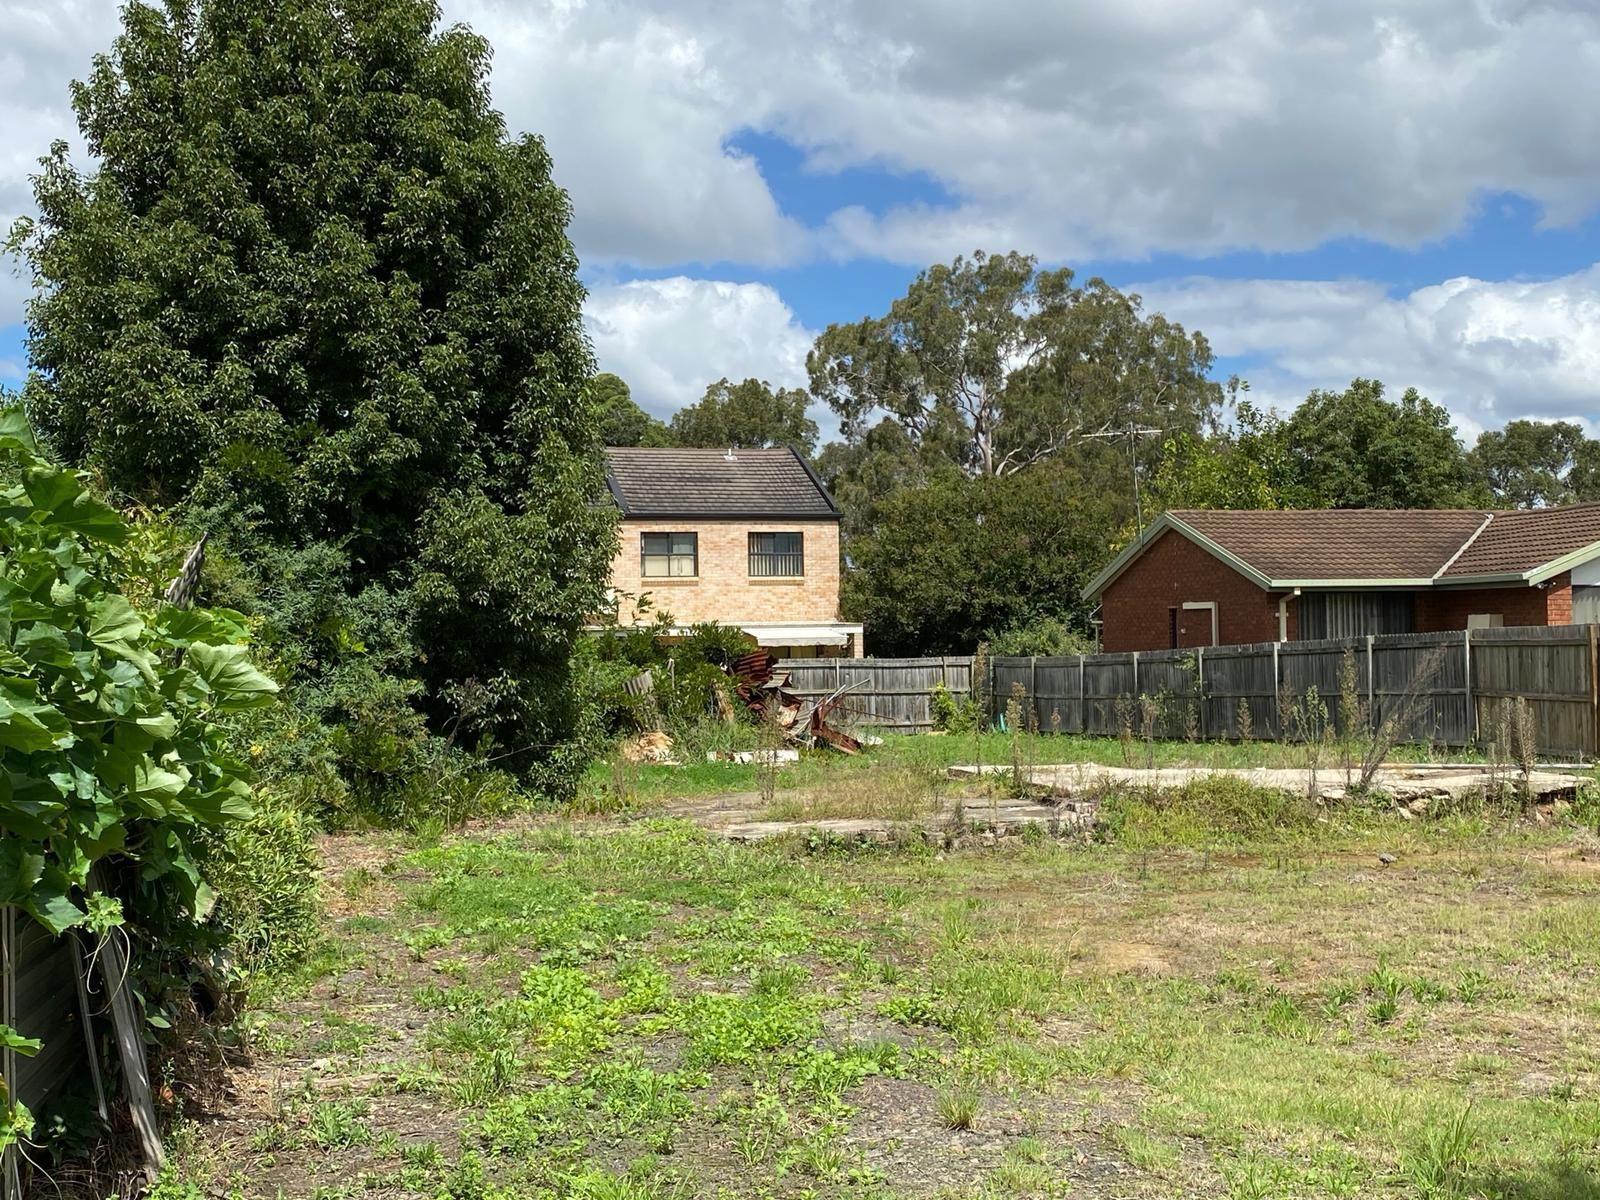 76 Pine Street, Rydalmere, NSW 2116